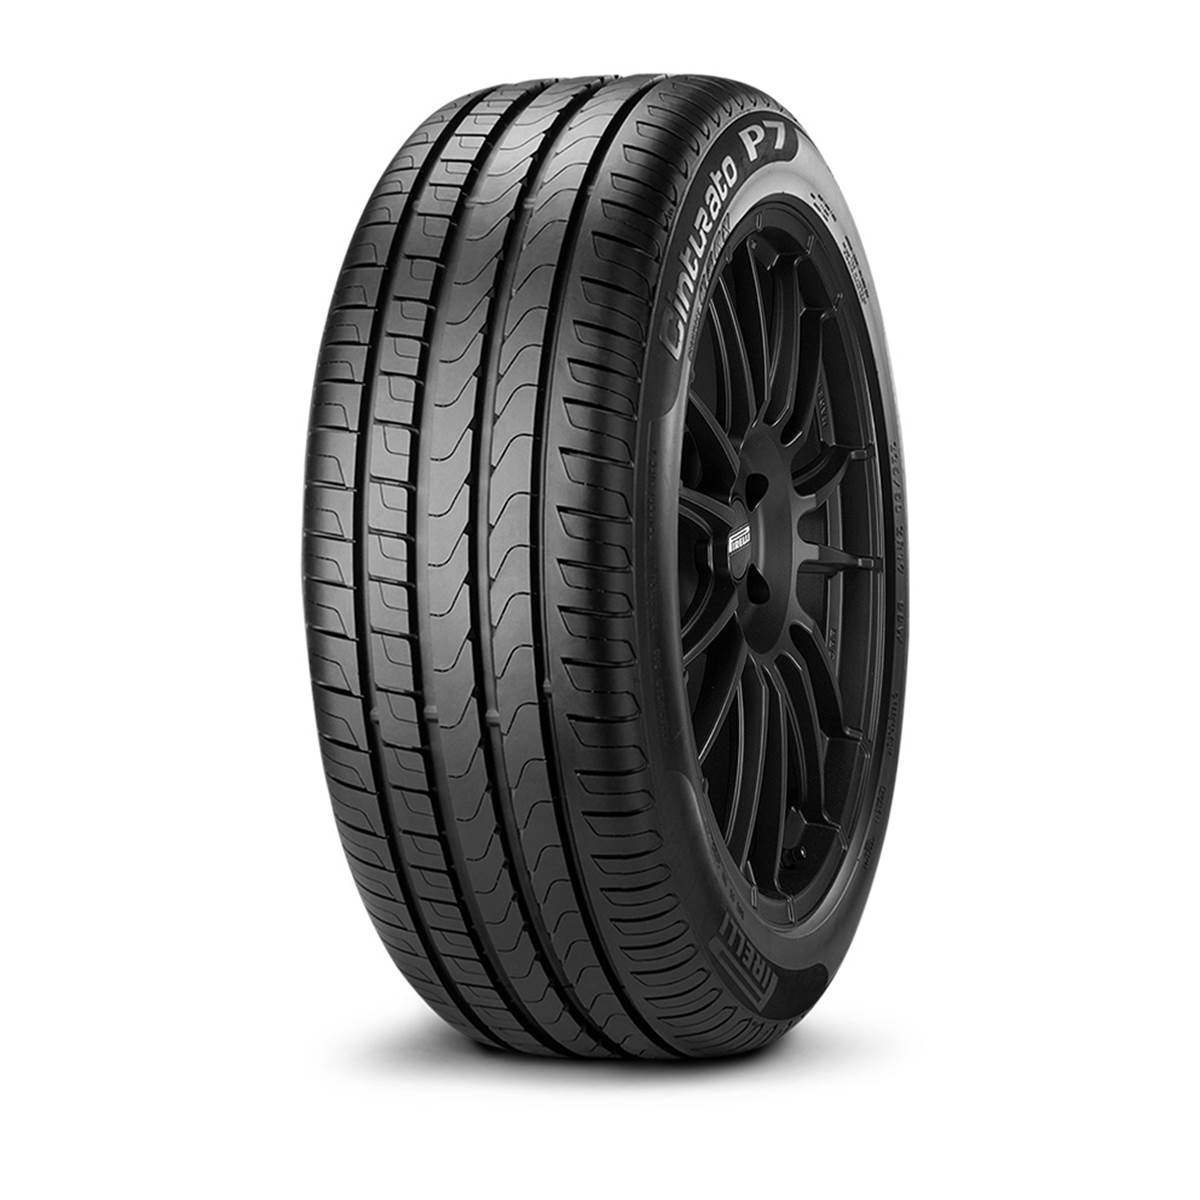 Pneu Pirelli 215/55R16 93V Cinturato P7